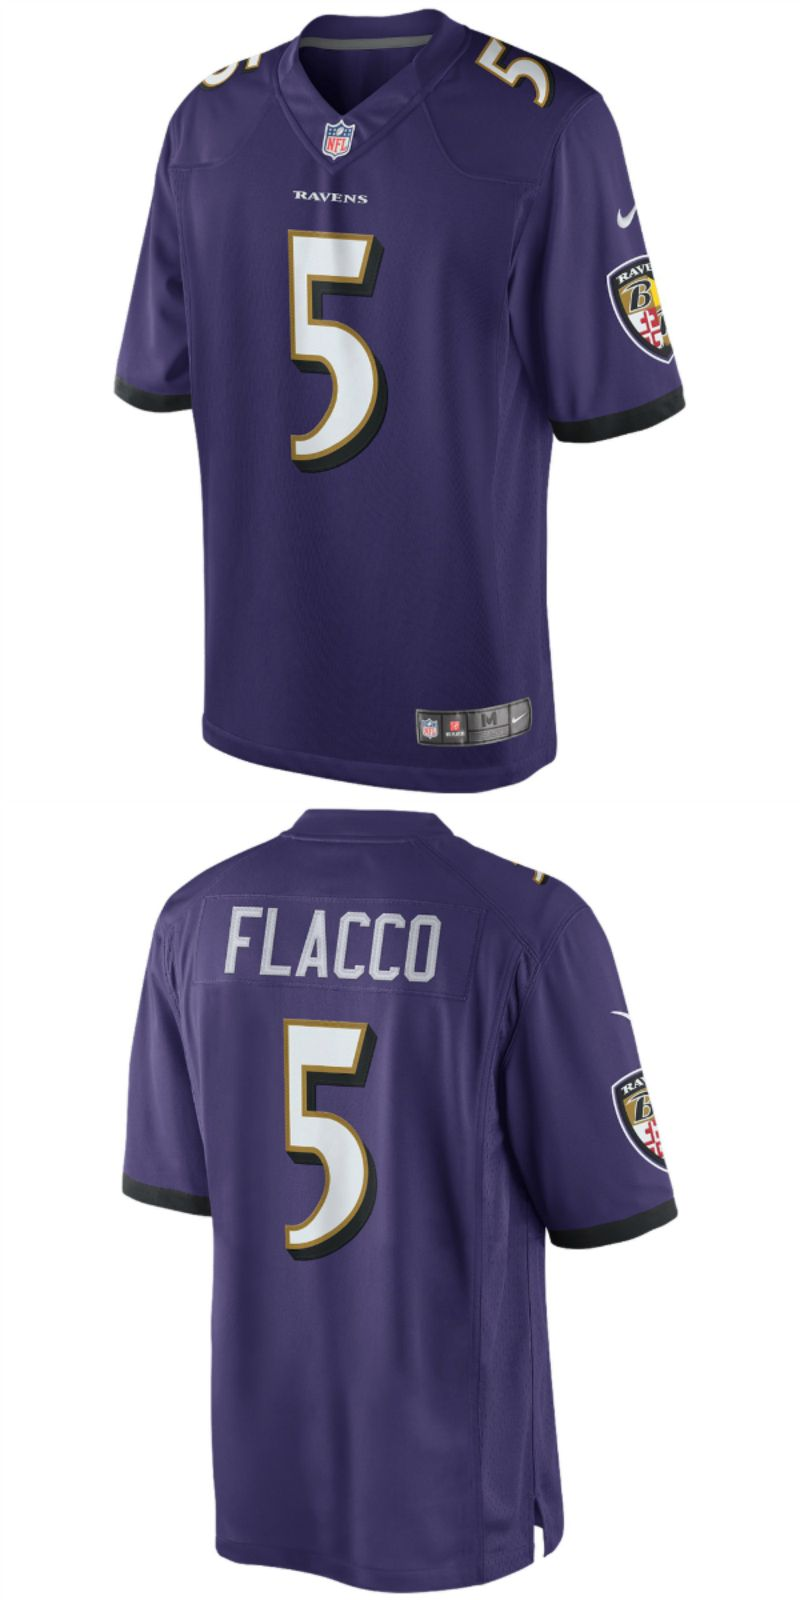 huge discount f41c0 27e8a UP TO 70% OFF. Joe Flacco Baltimore Ravens Nike Limited ...